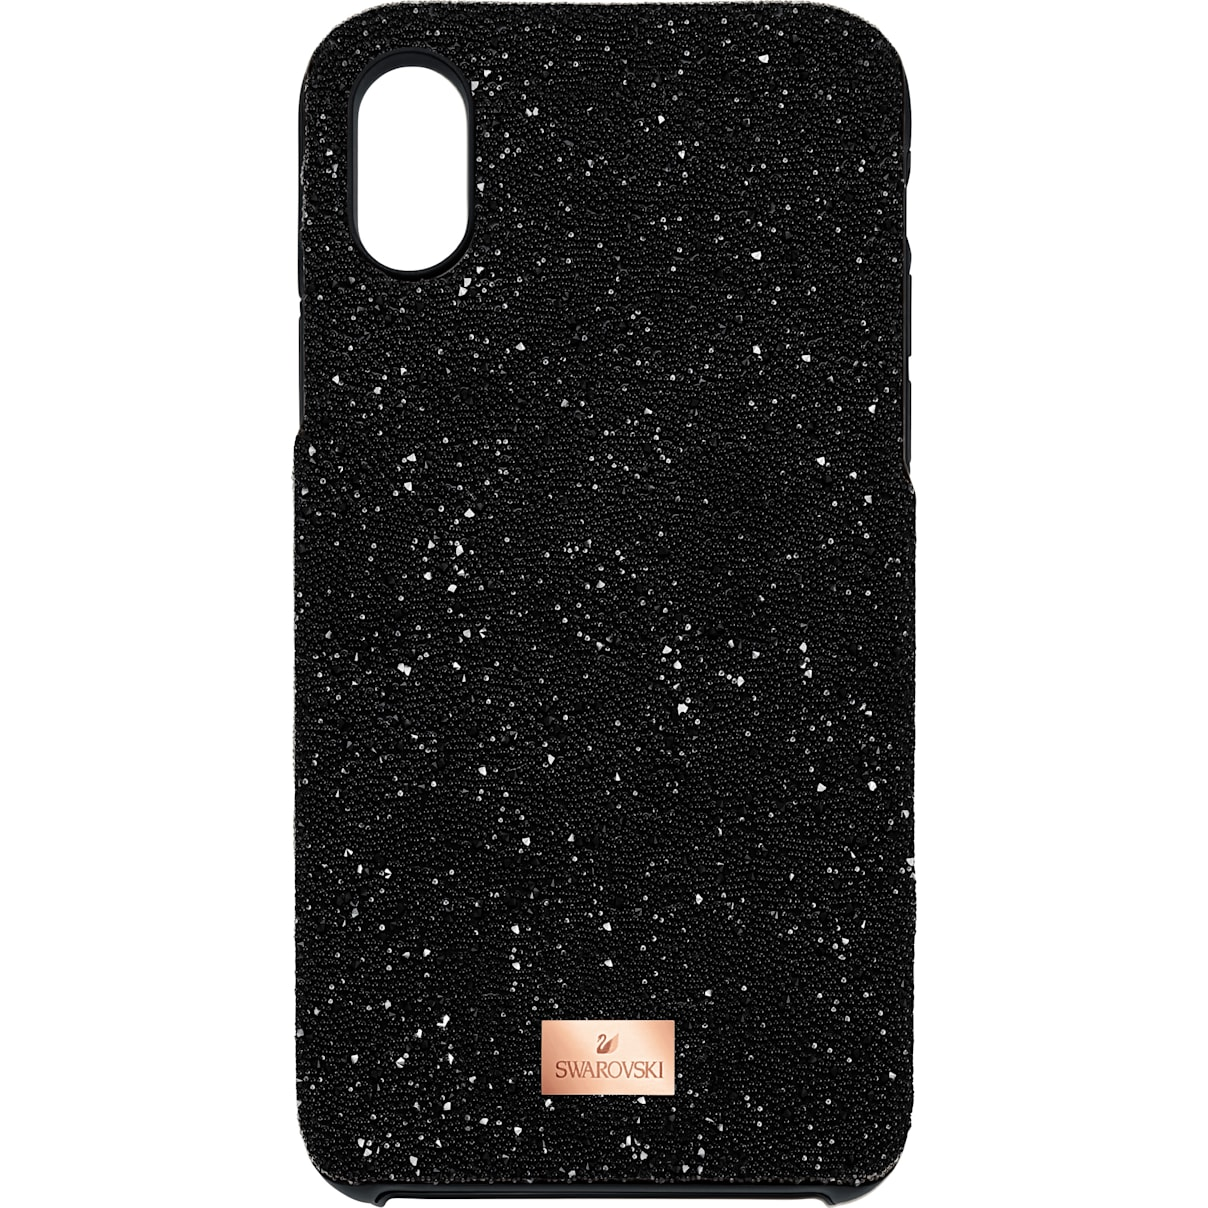 Swarovski High Smartphone Case with integrated Bumper, iPhone® X/XS, Black